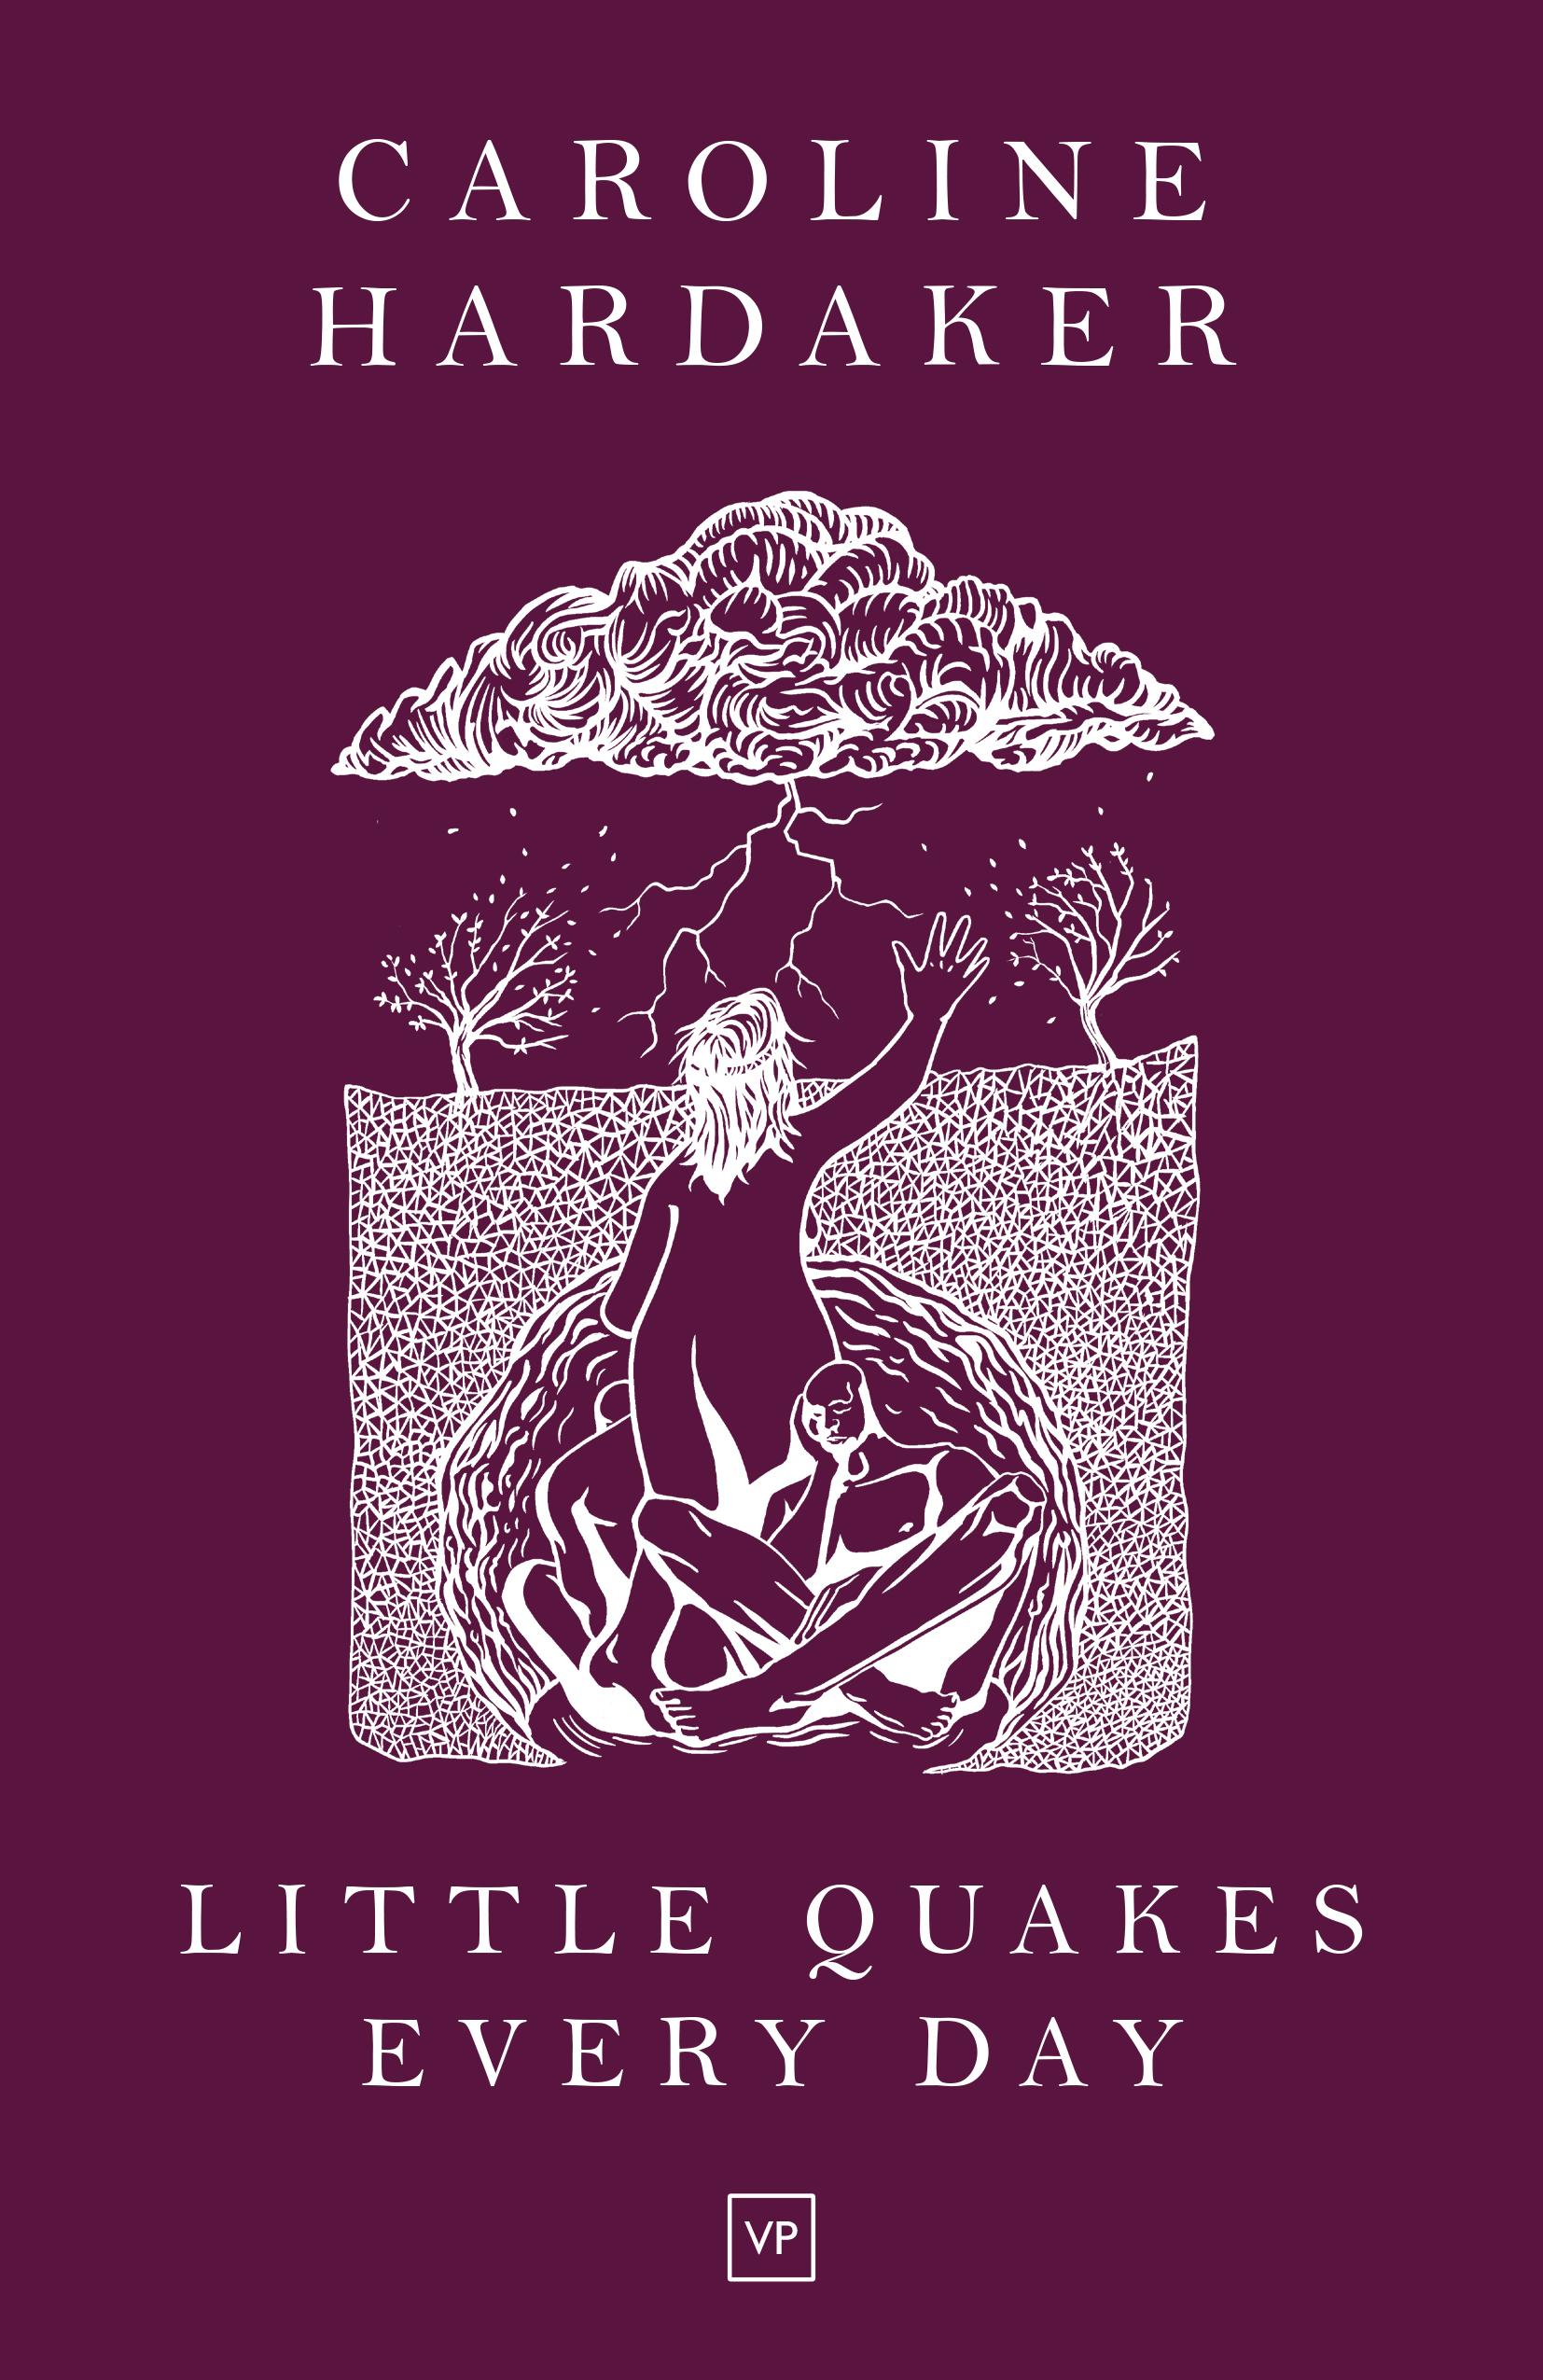 Little Quakes Every Day by Caroline Hardaker